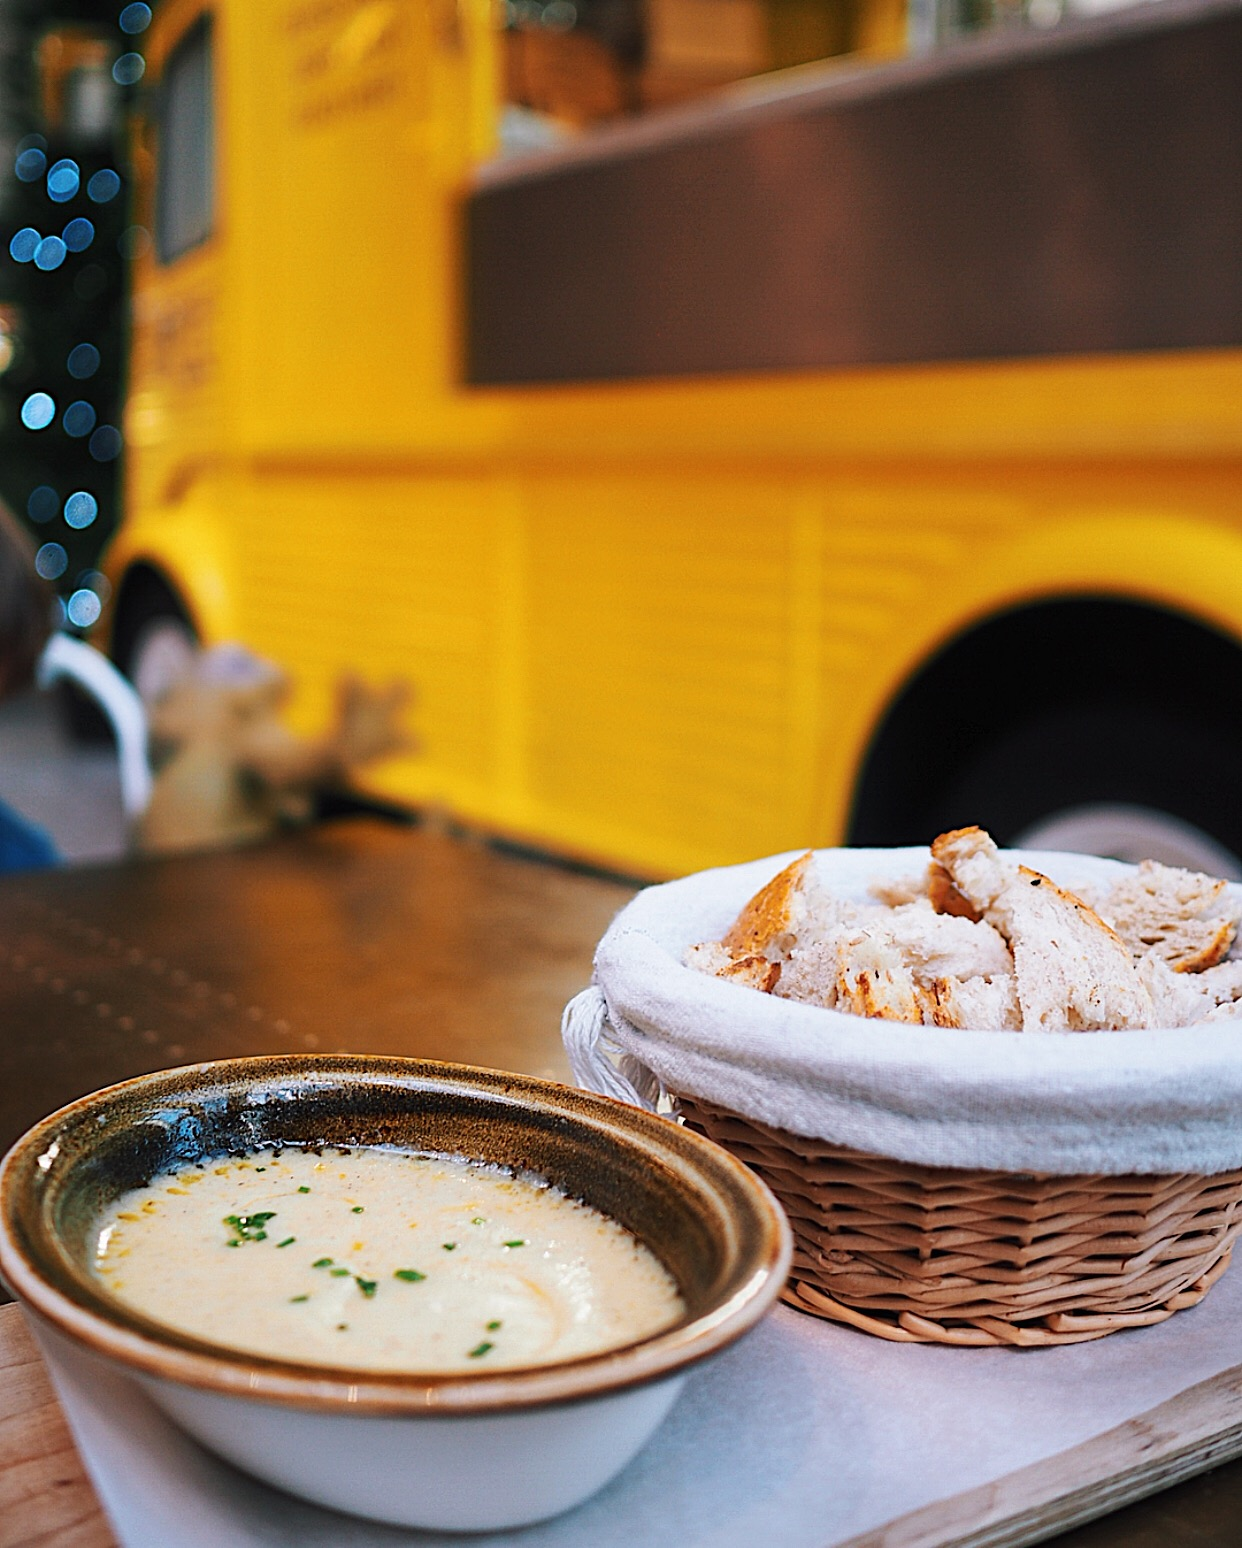 Cheese fondue and Amelie's yellow citroen van